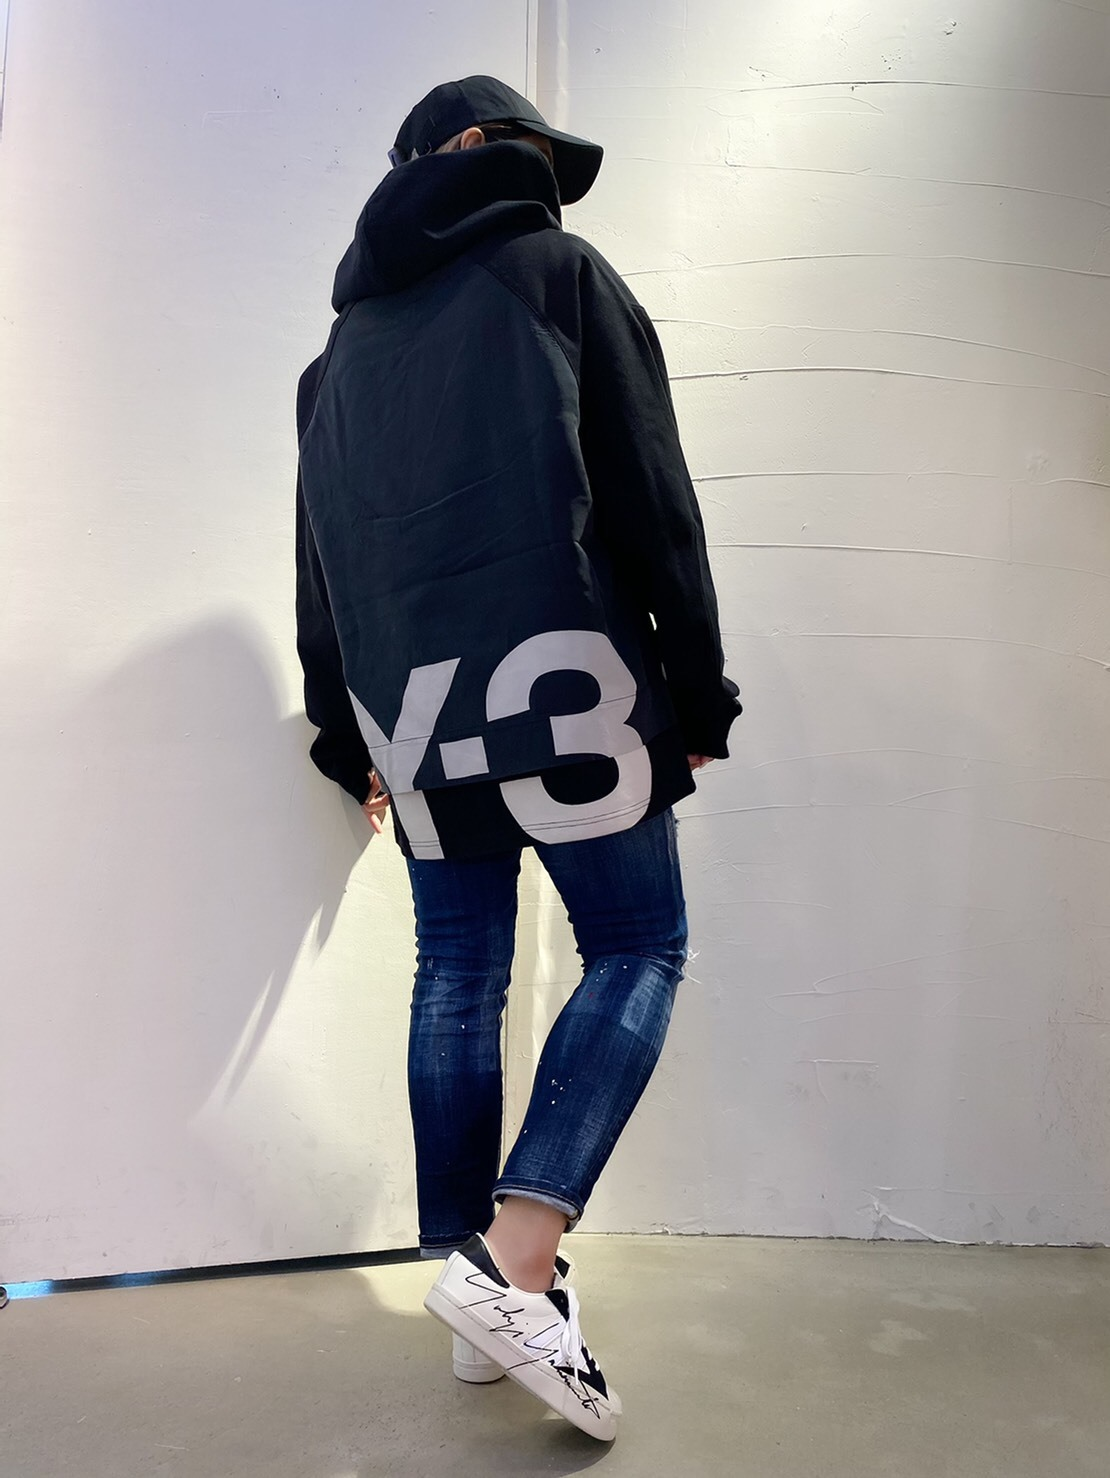 「Y-3 ワイスリー」新作パーカー【M SD RWTRY GFXHOOD_LG】入荷です。_c0204280_18201389.jpg